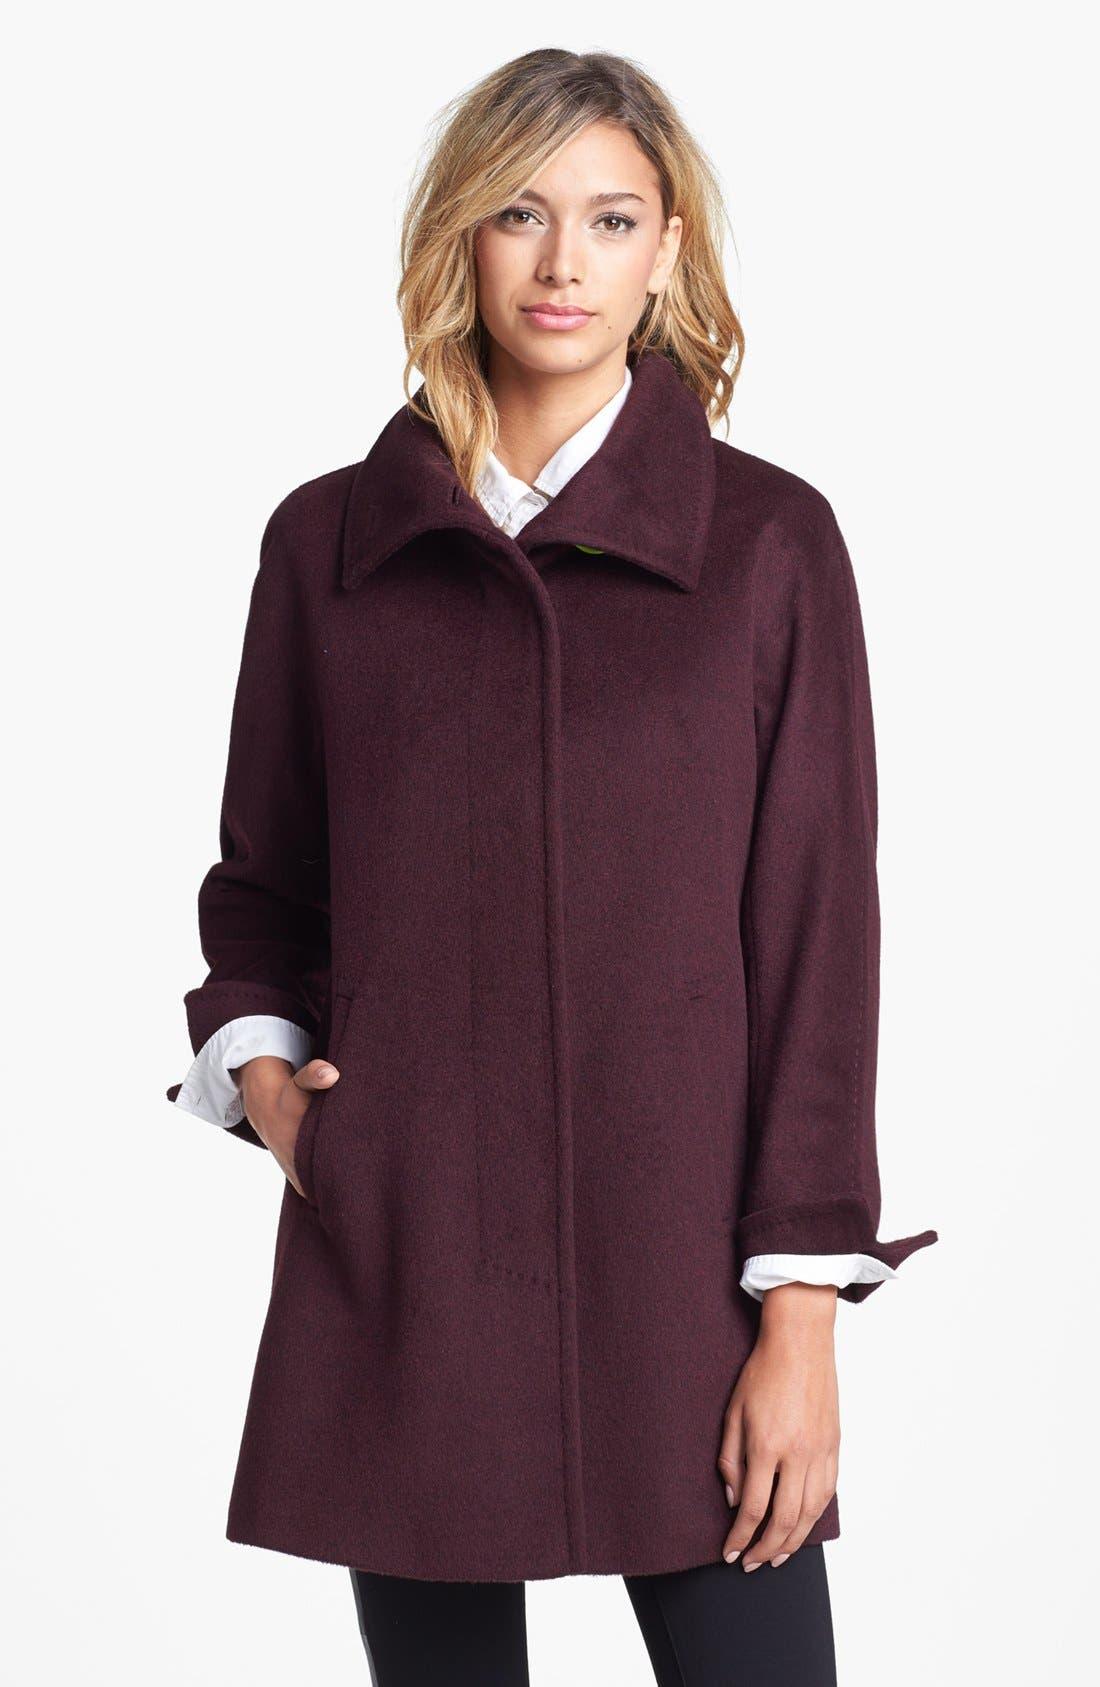 Alternate Image 1 Selected - Ellen Tracy Wool Blend A-Line Coat (Nordstrom Exclusive) (Regular & Petite)